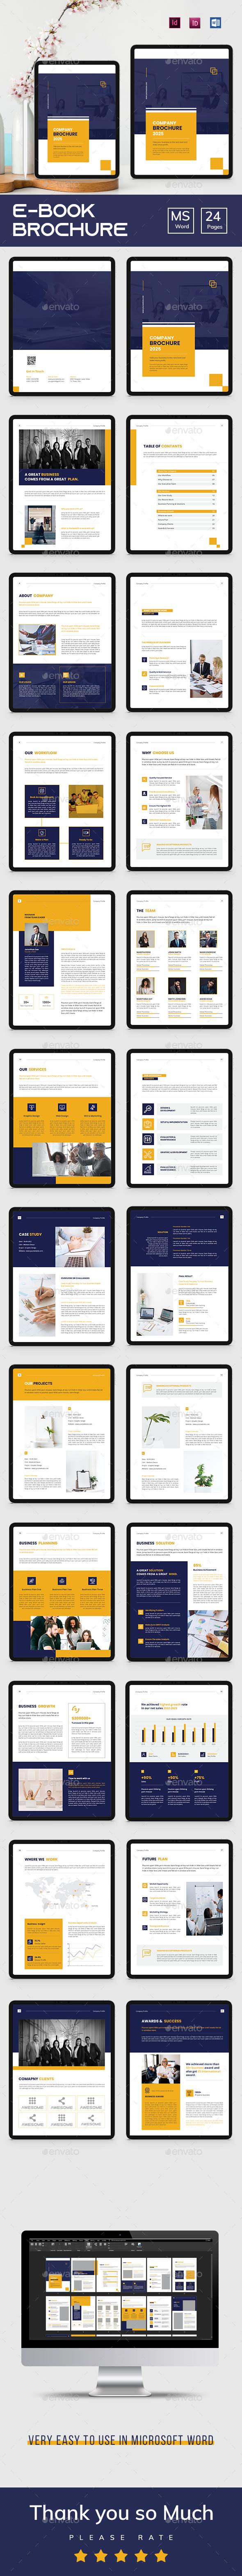 Corporate E-book Brochure Word Template